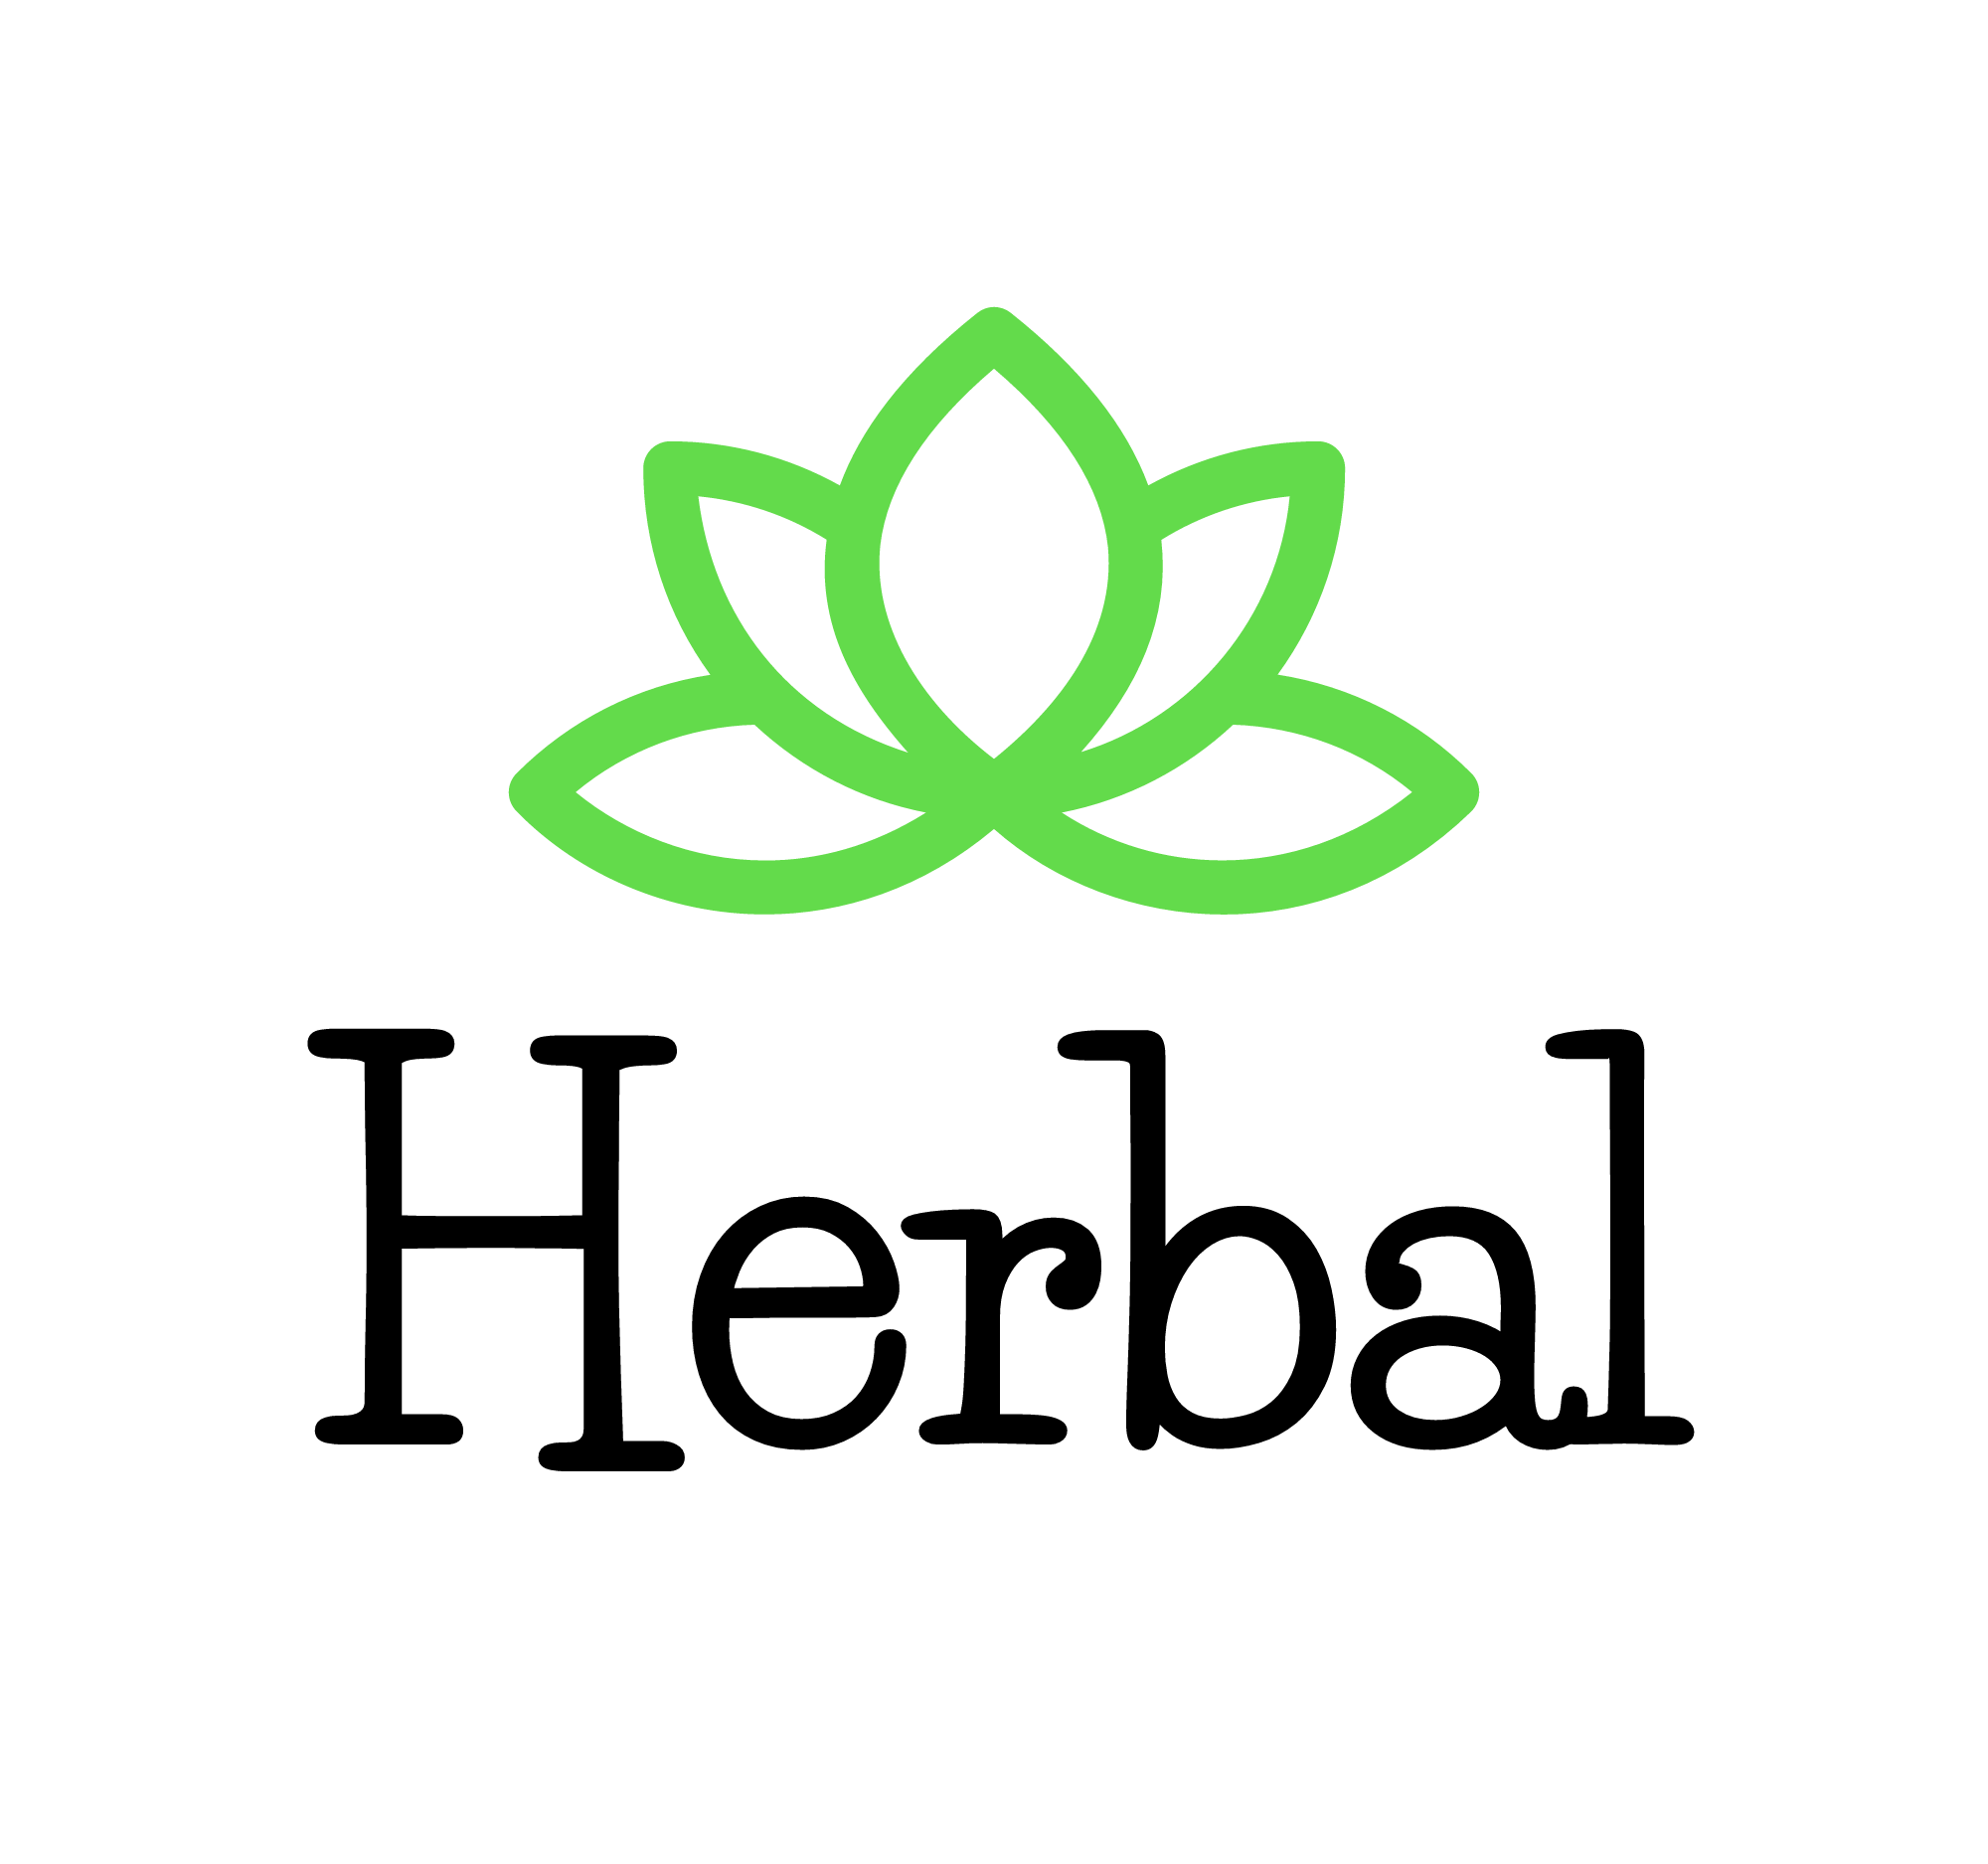 Hints of various herbal qualities (mint, oregano, sage, etc)